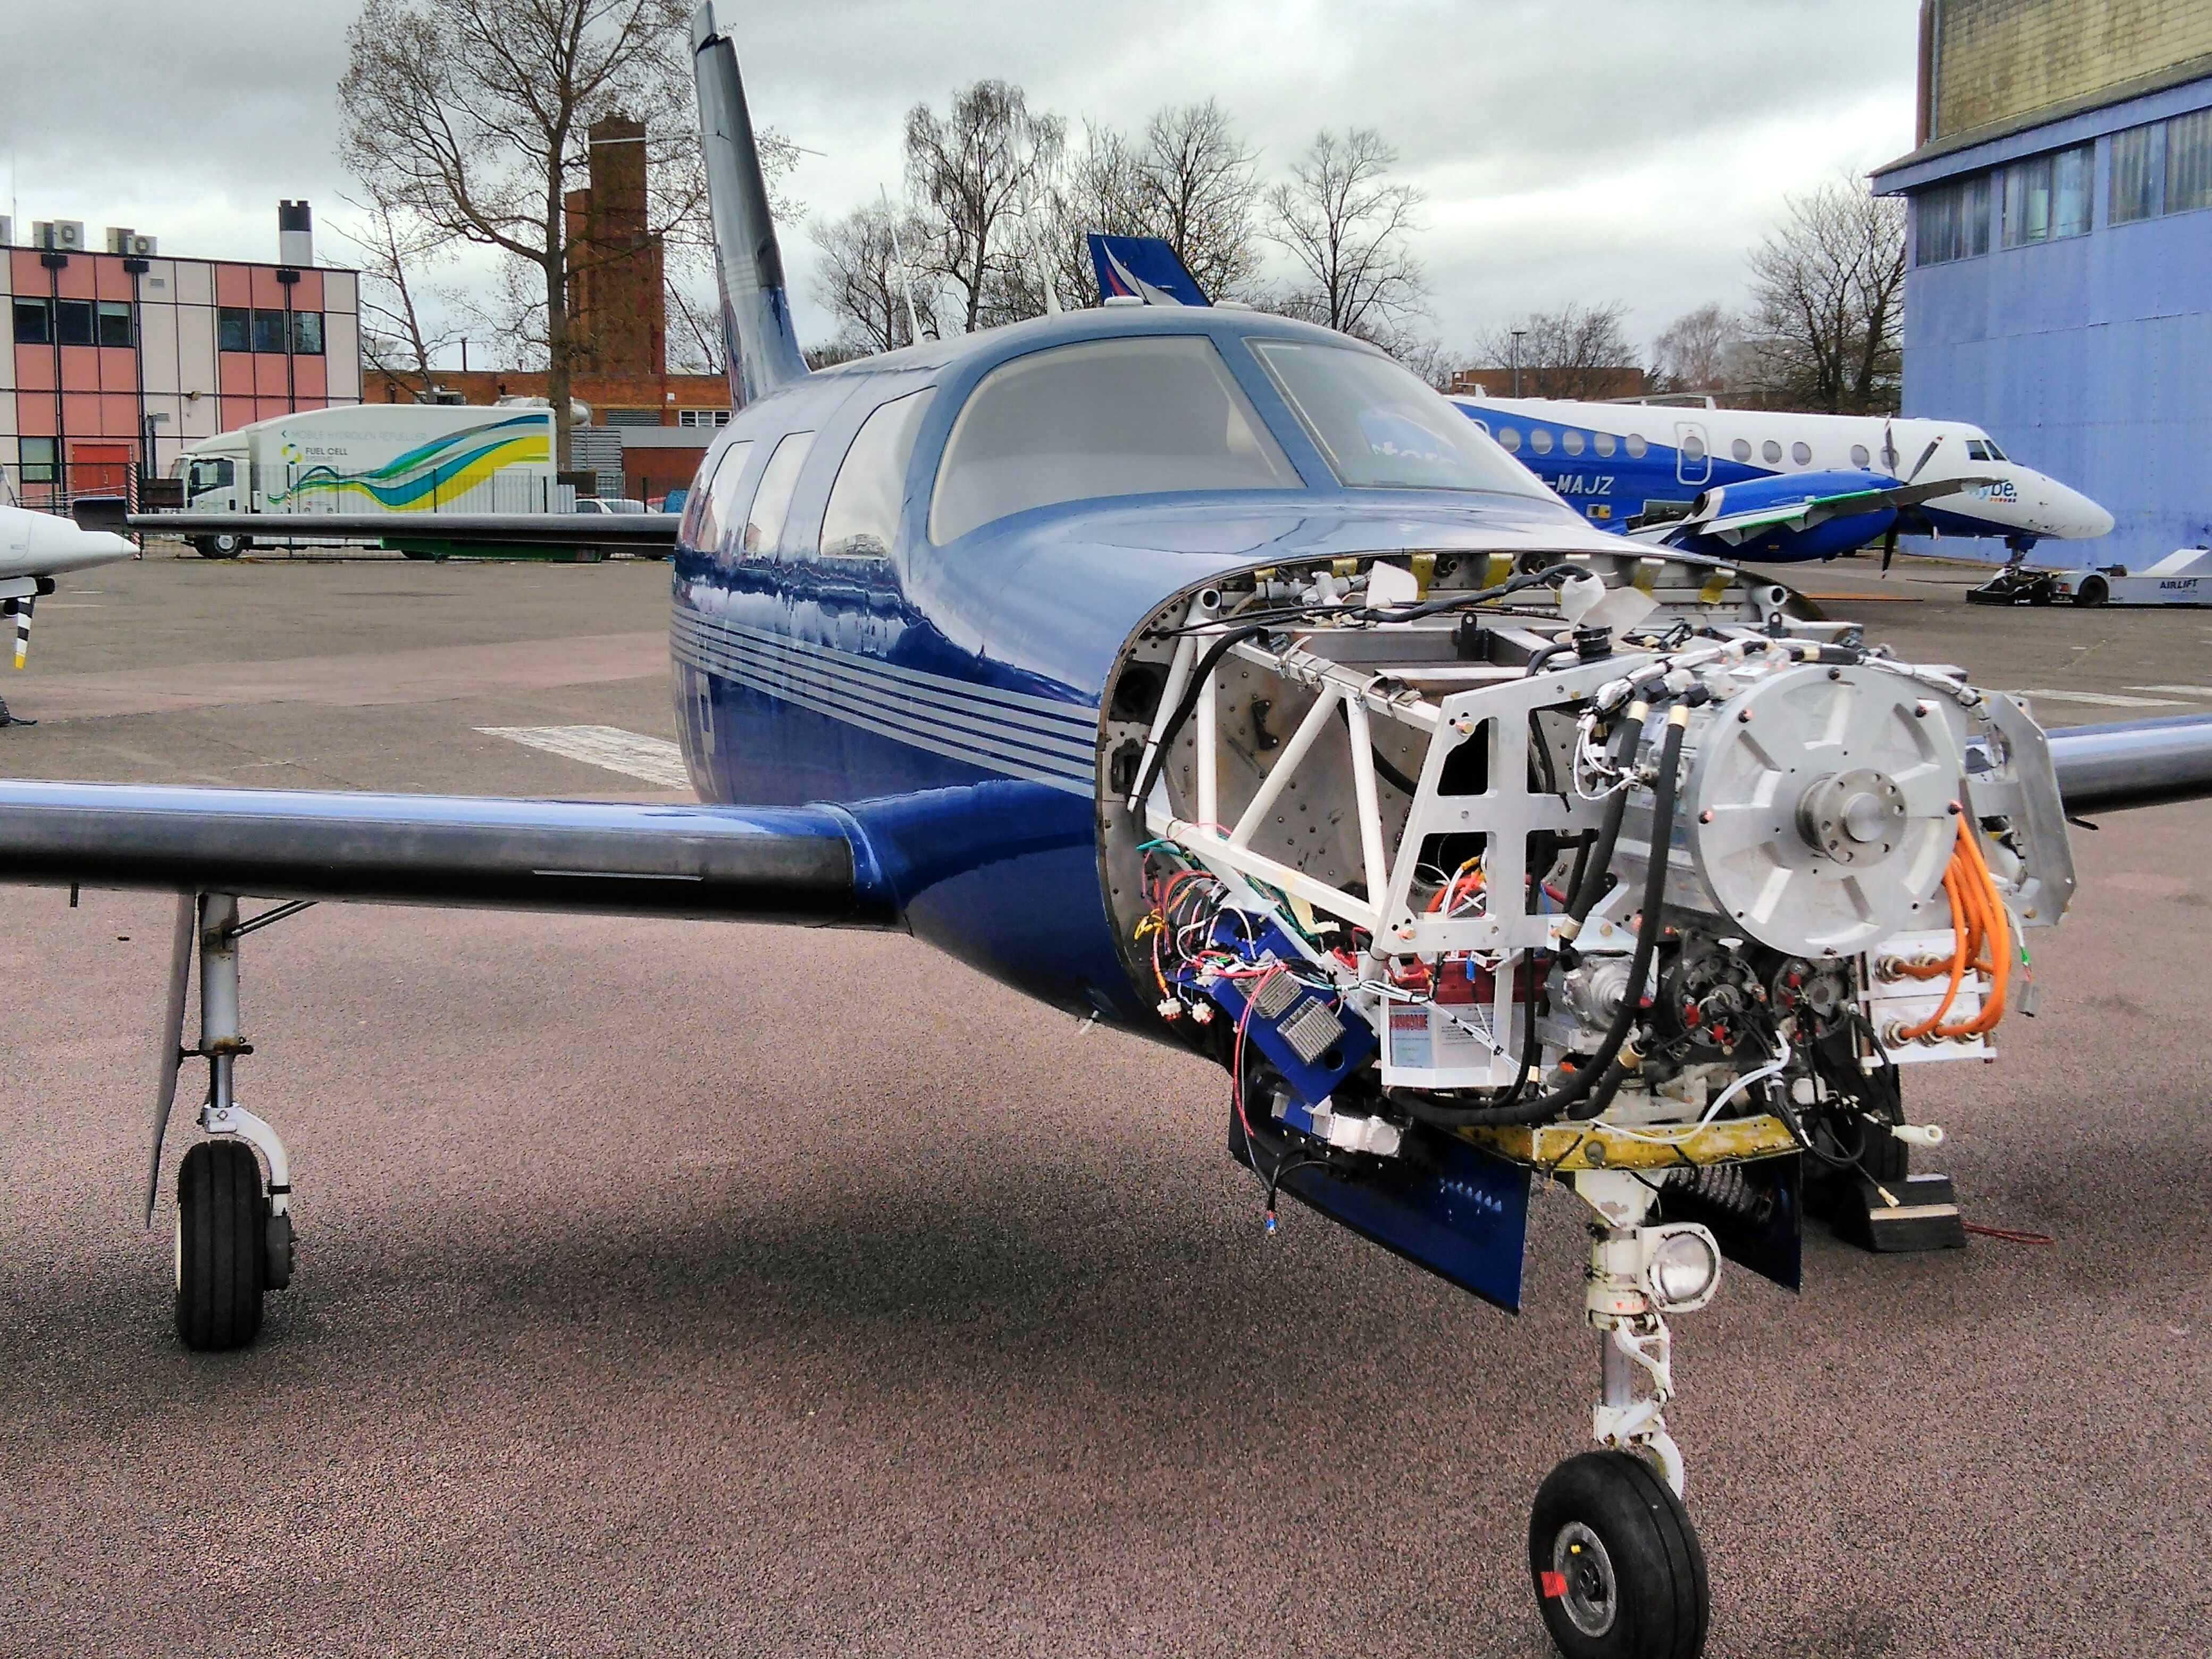 Gallery Hydrogen electric powertrain for aviation 2